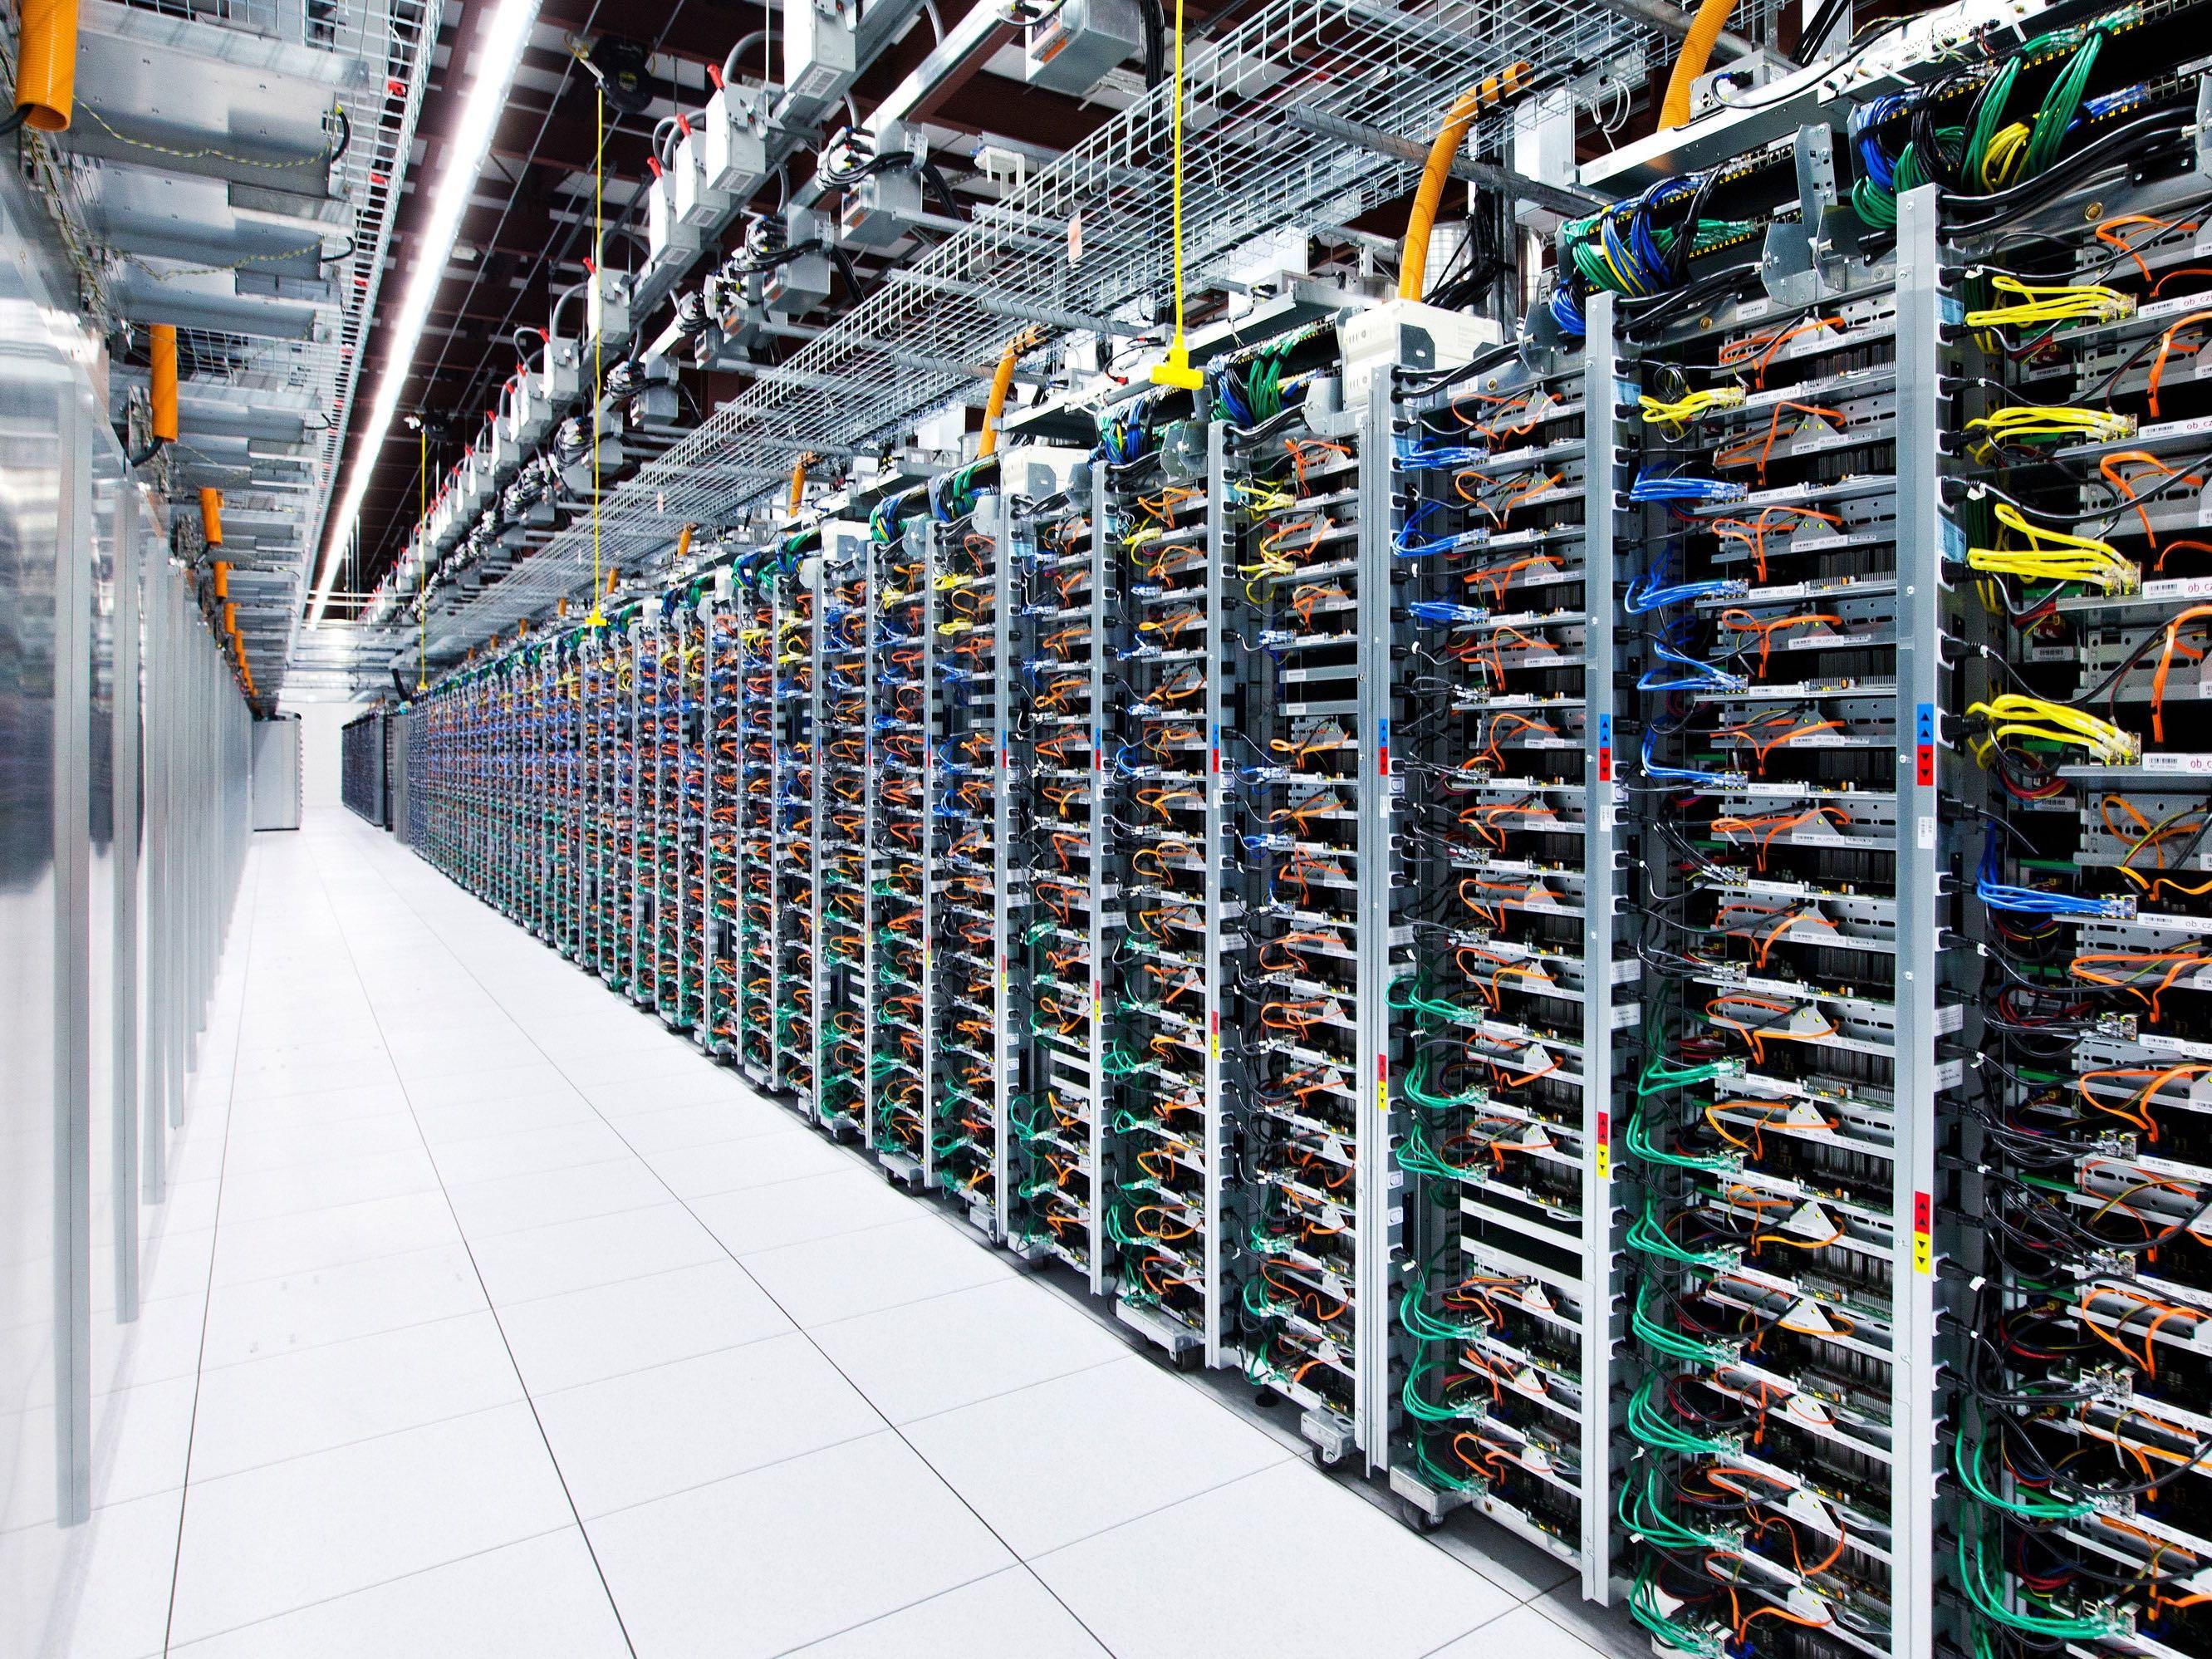 Appledatacenter